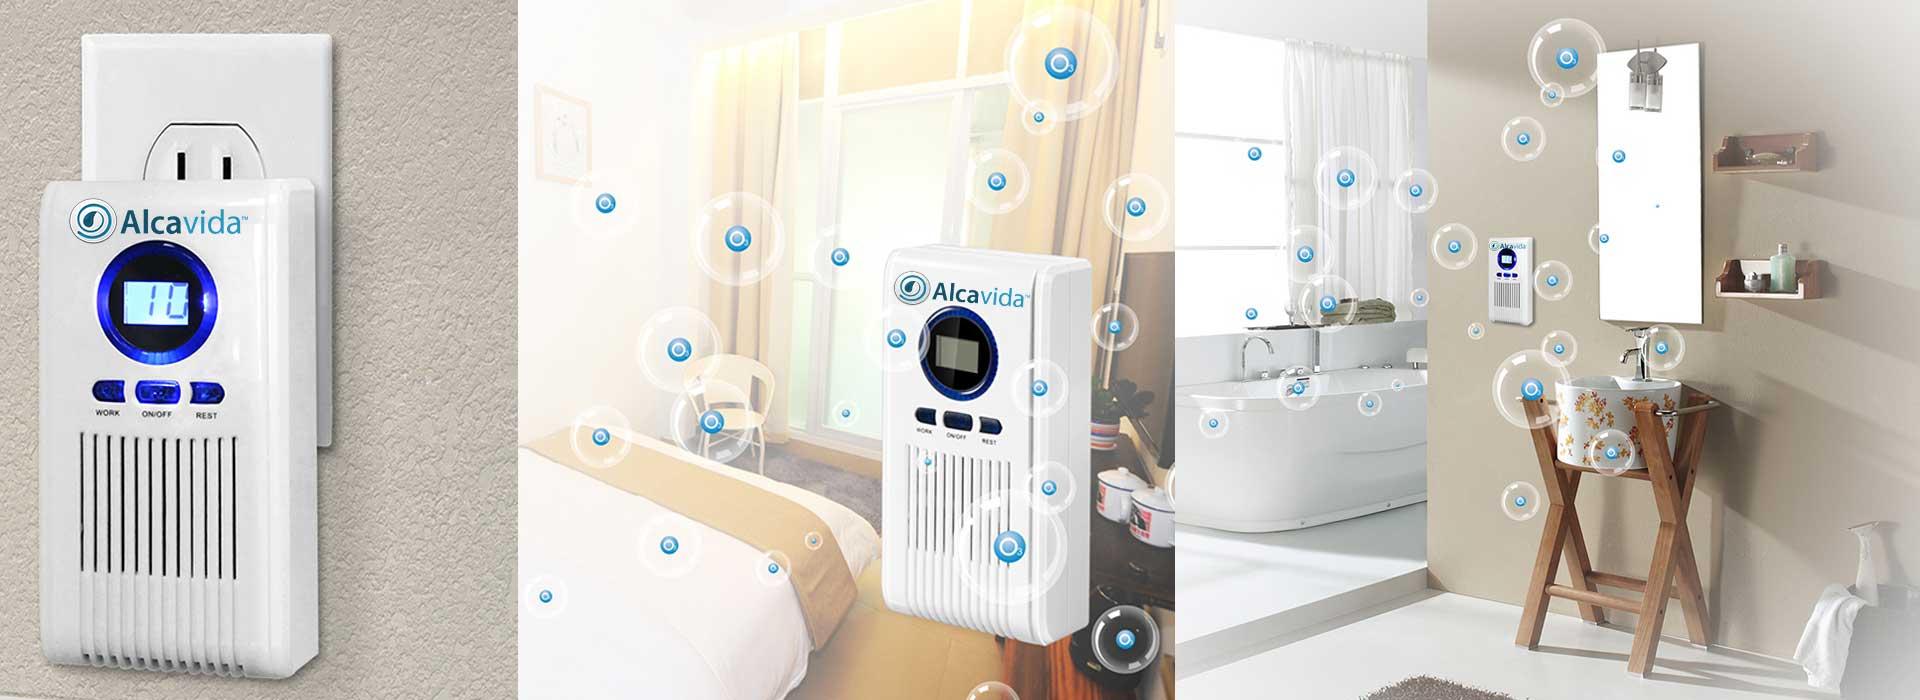 purificadores de aire-ionizadores